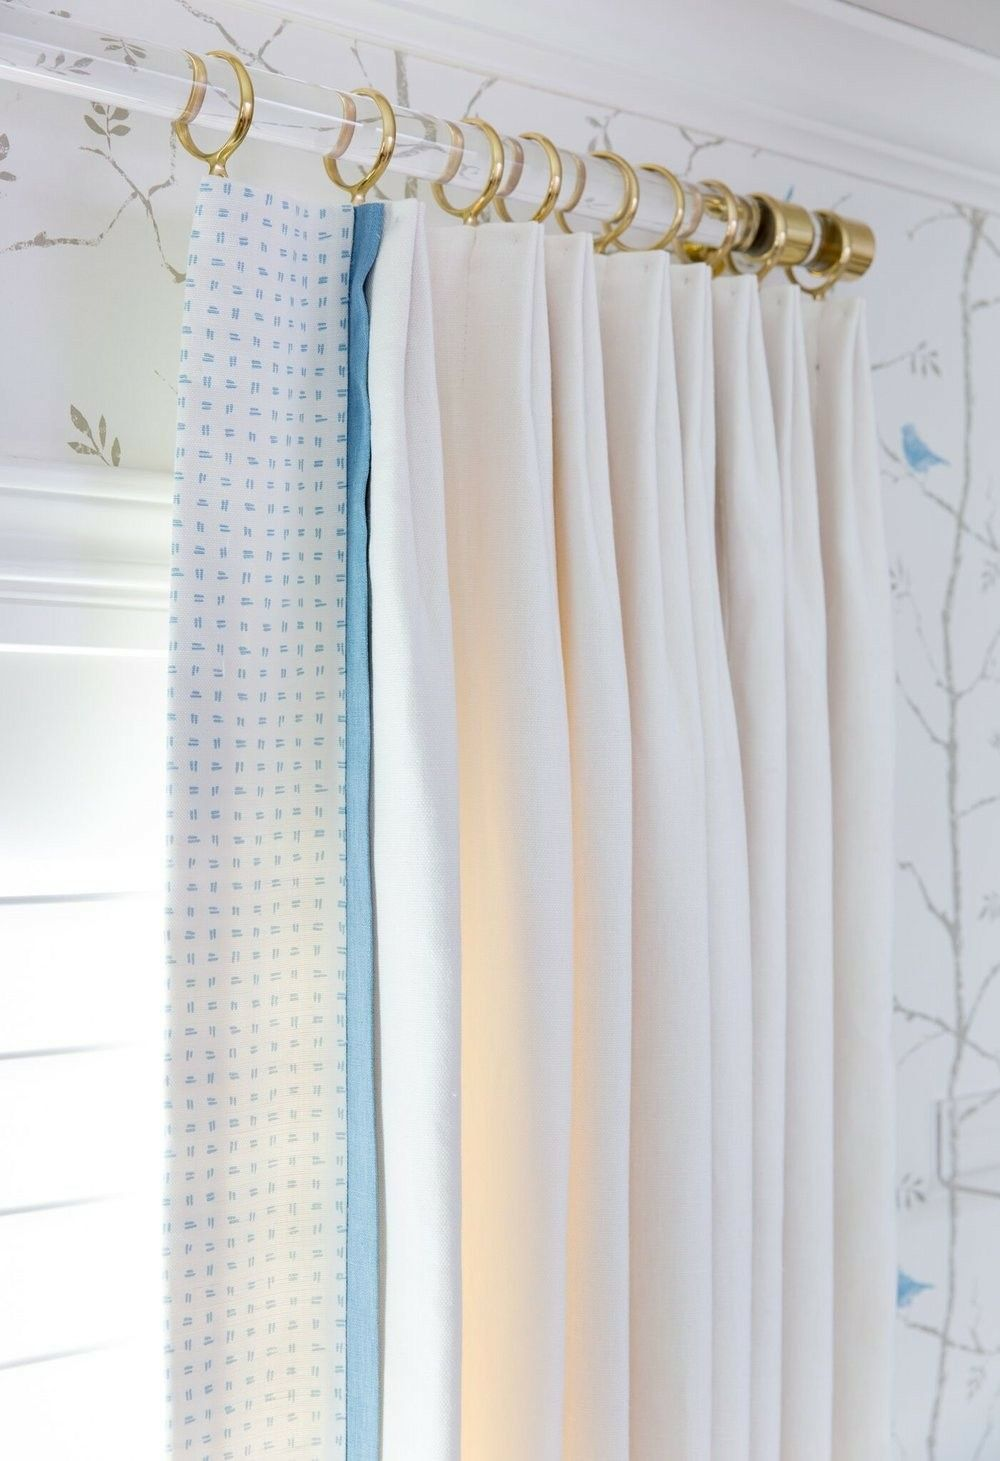 Fabric Trim Used At Leading Edge Jennifer Barron Interiors